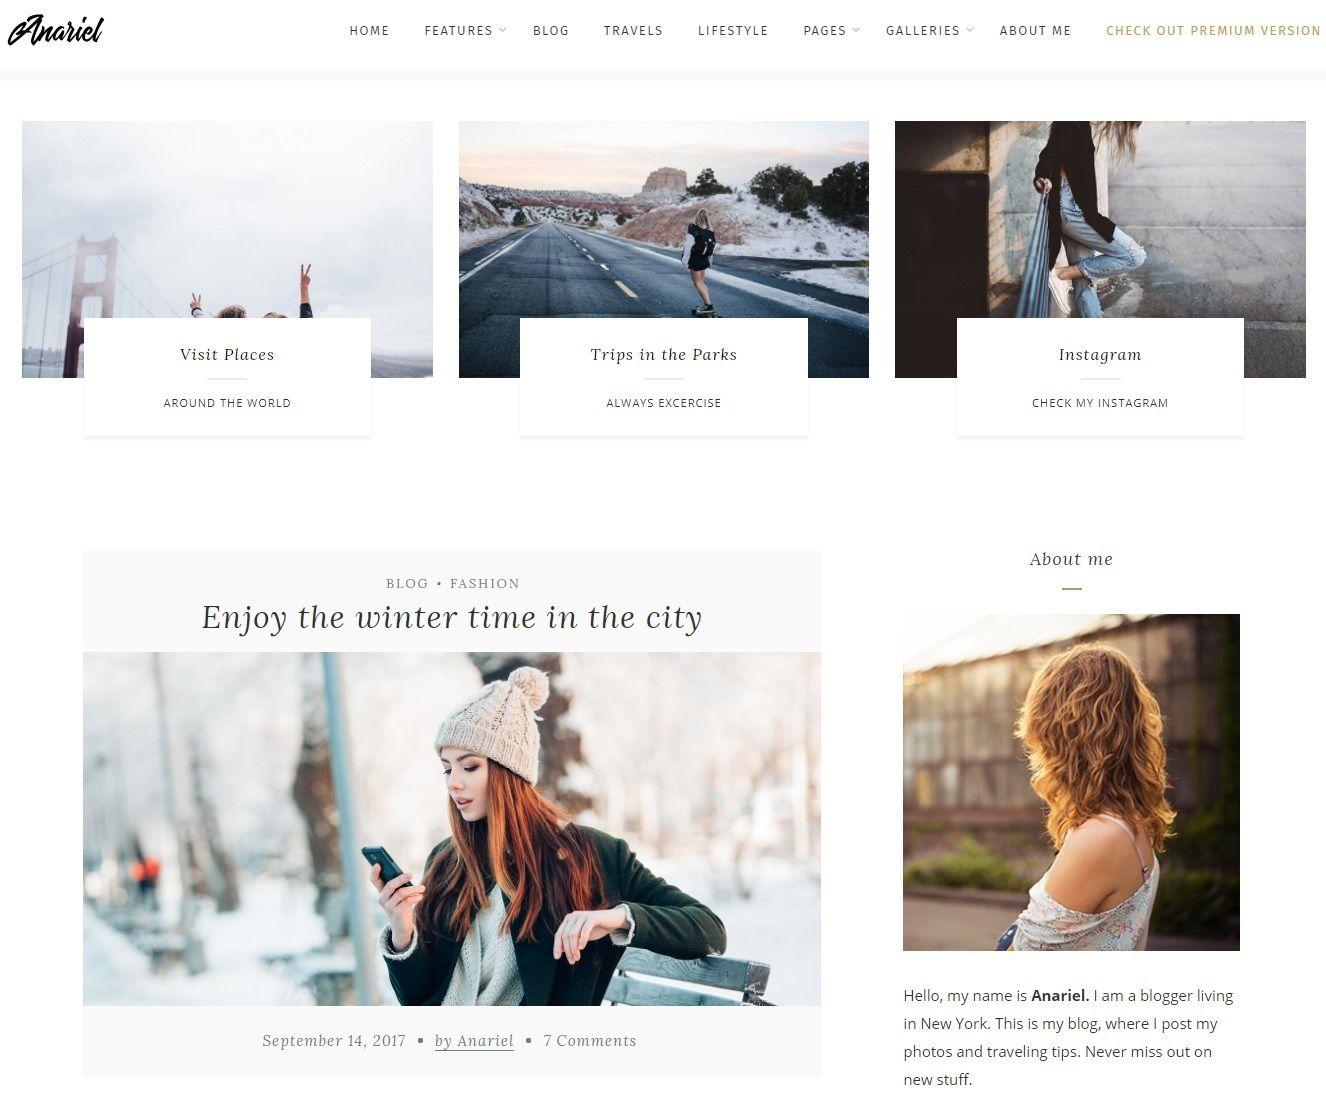 007 Staggering Free Blog Template Wordpres Sample  Wordpress Best Travel Theme Food 2020Full